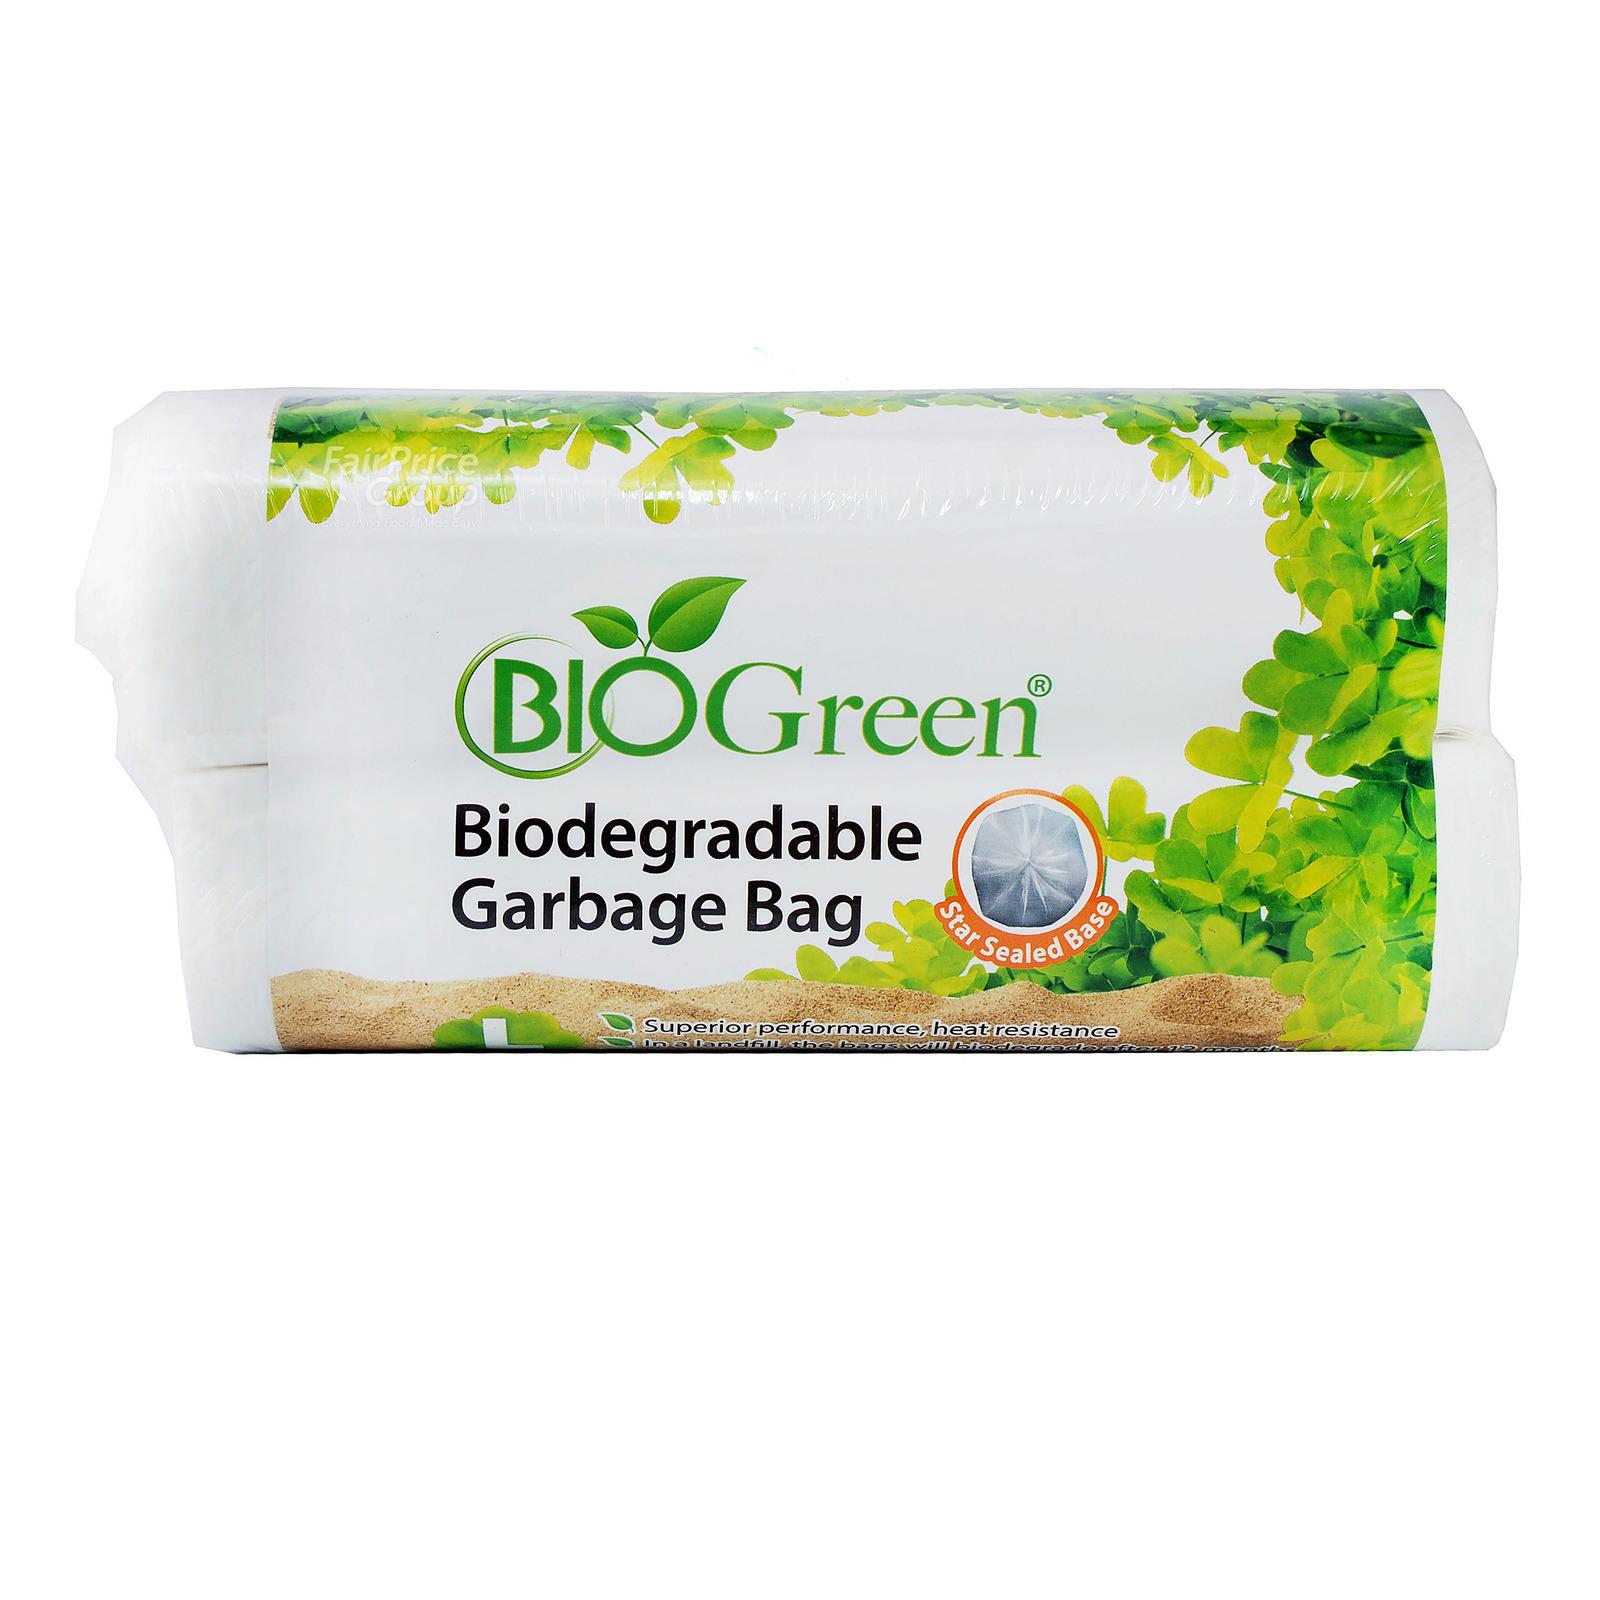 Bio Green Biodegradable Garbage Bag - L